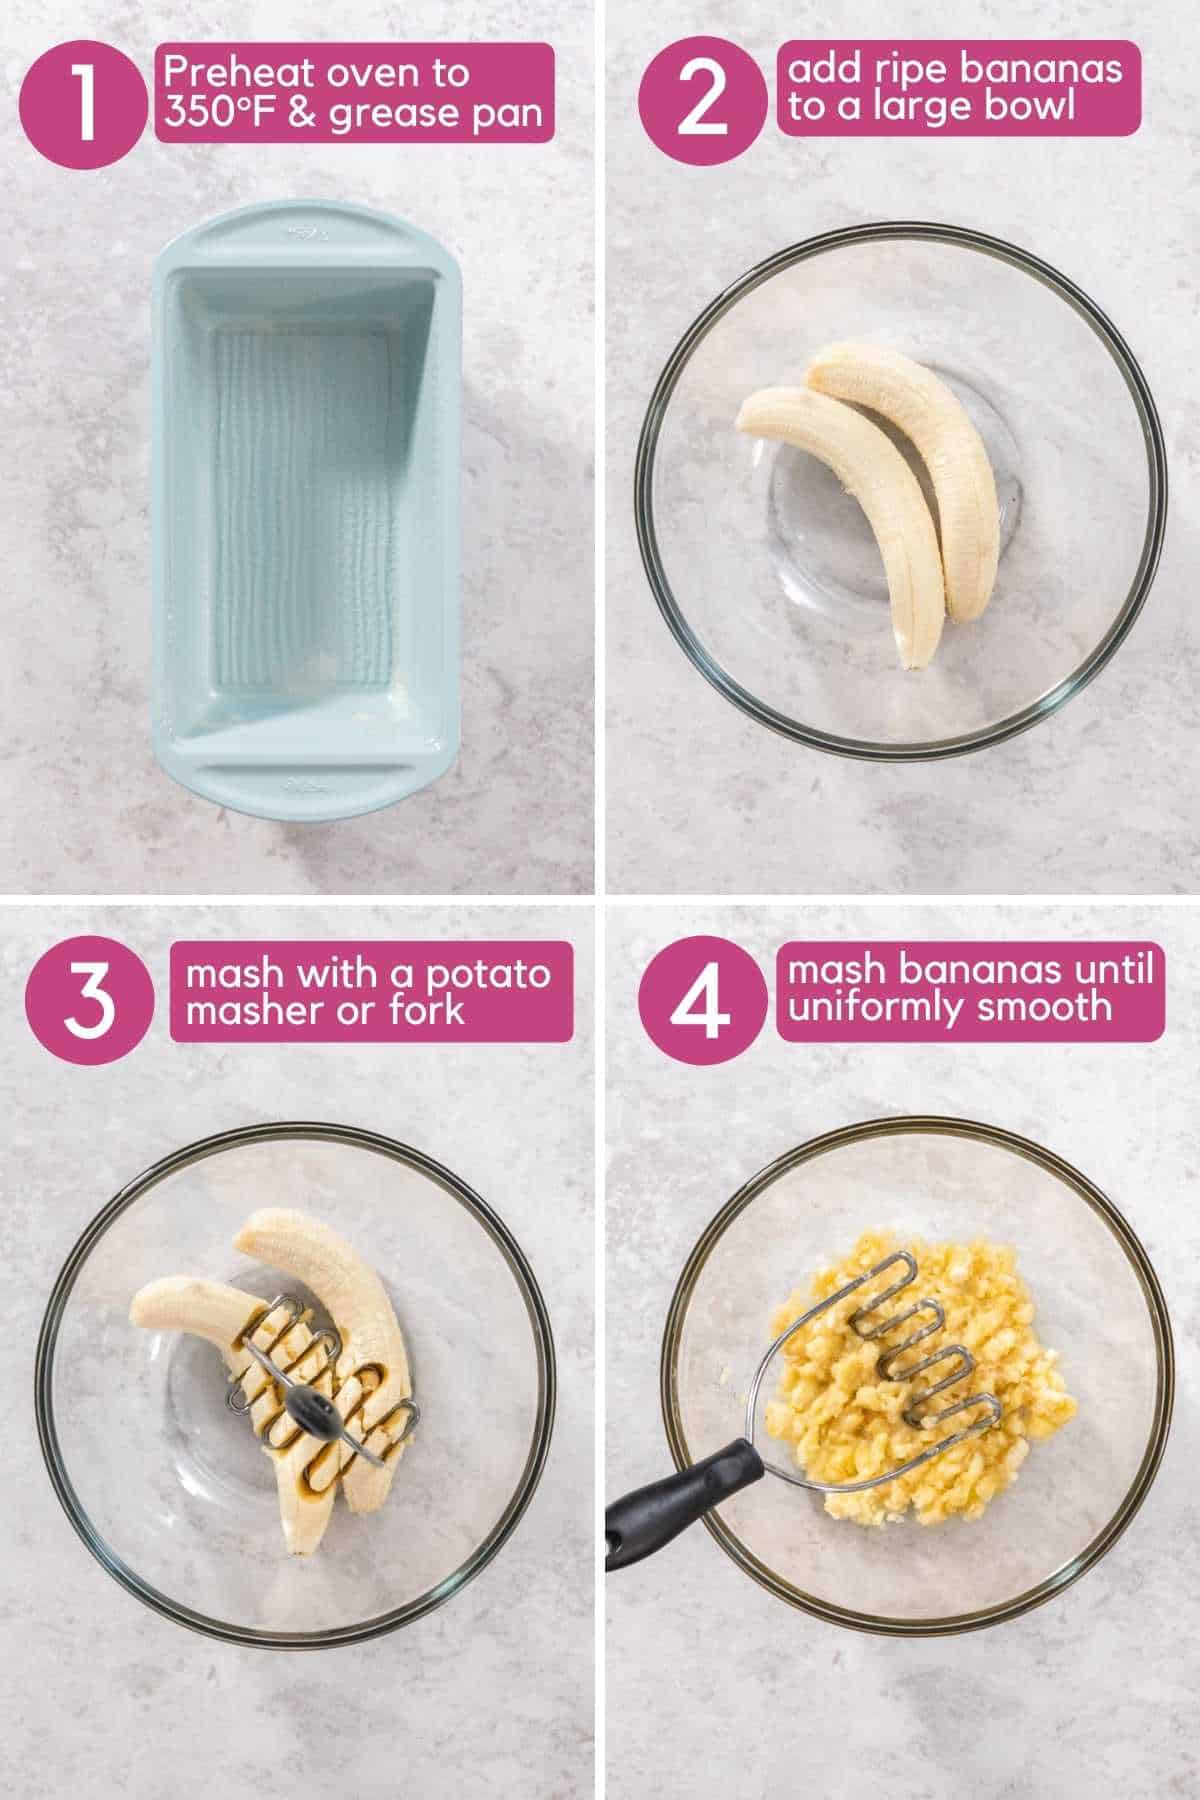 Mash bananas for one bowl banana bread.